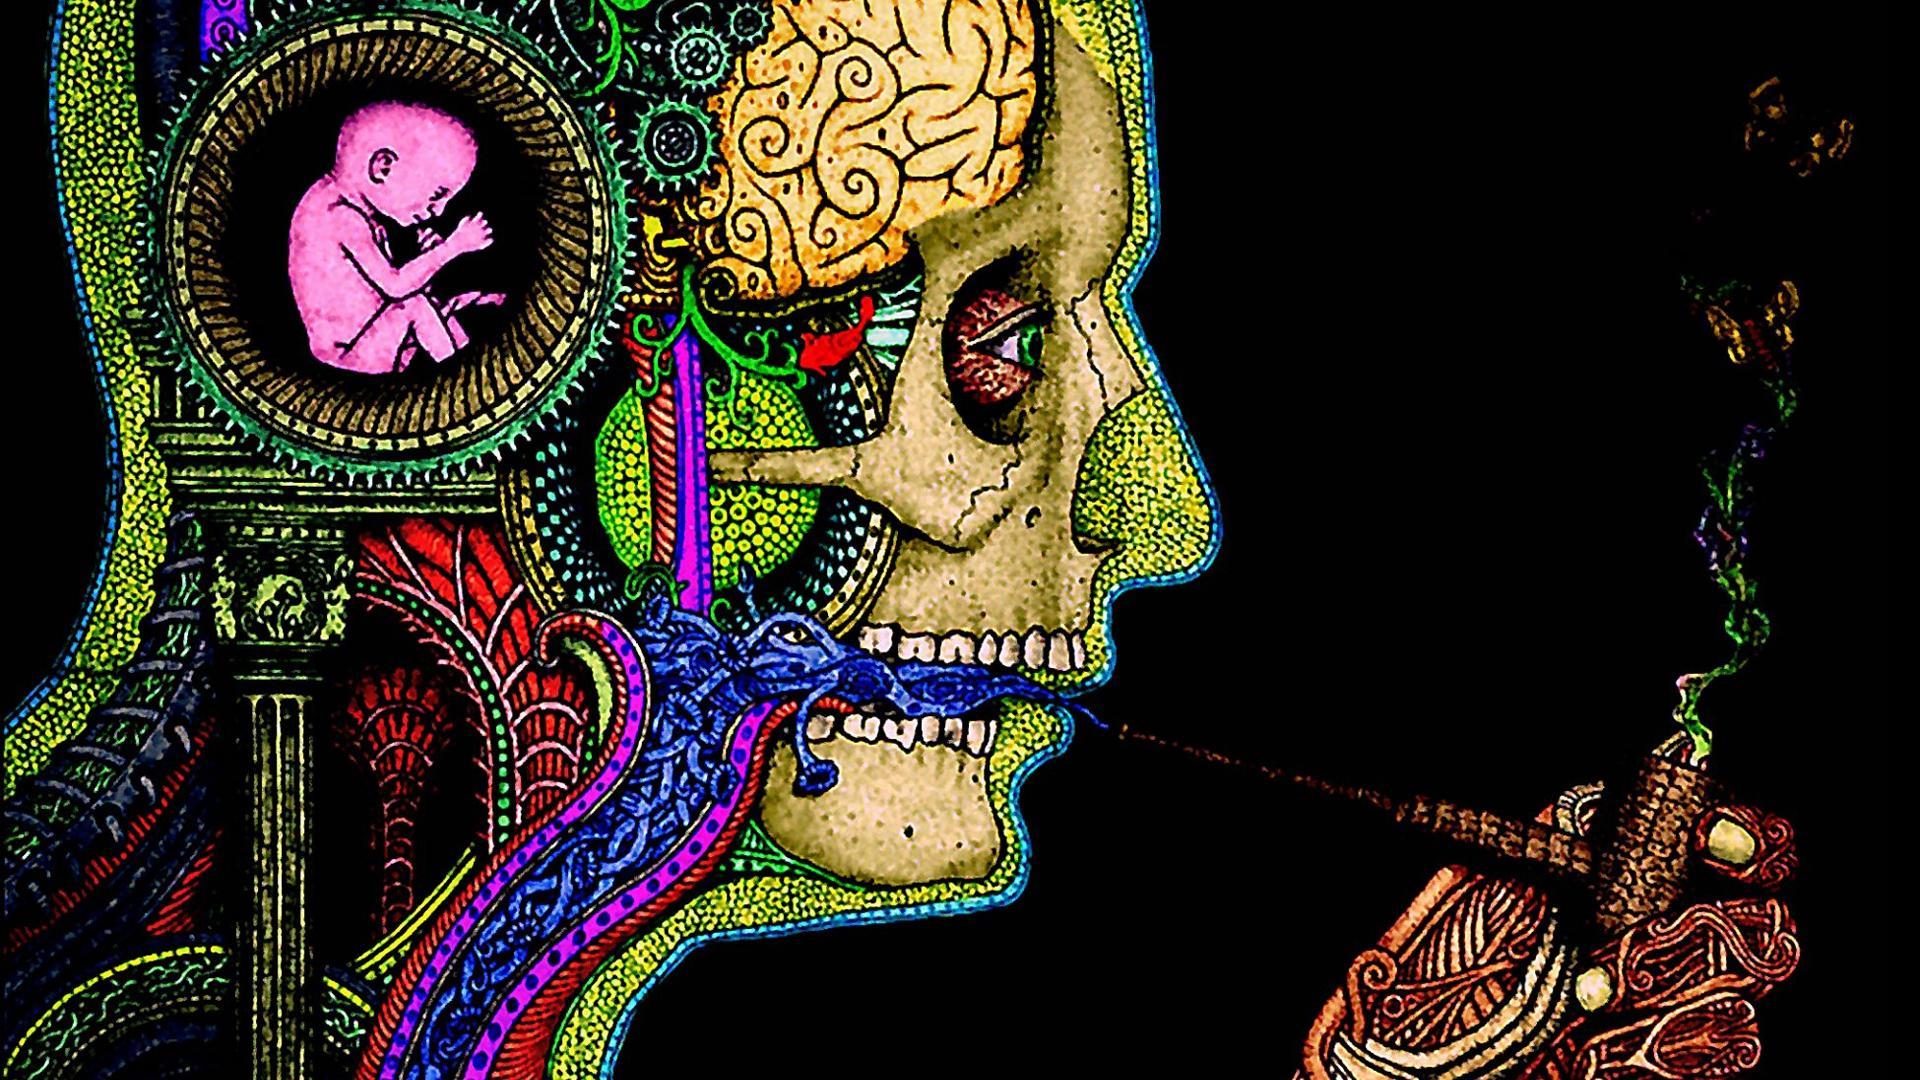 Psychedelic Wallpaper 1920x1080p